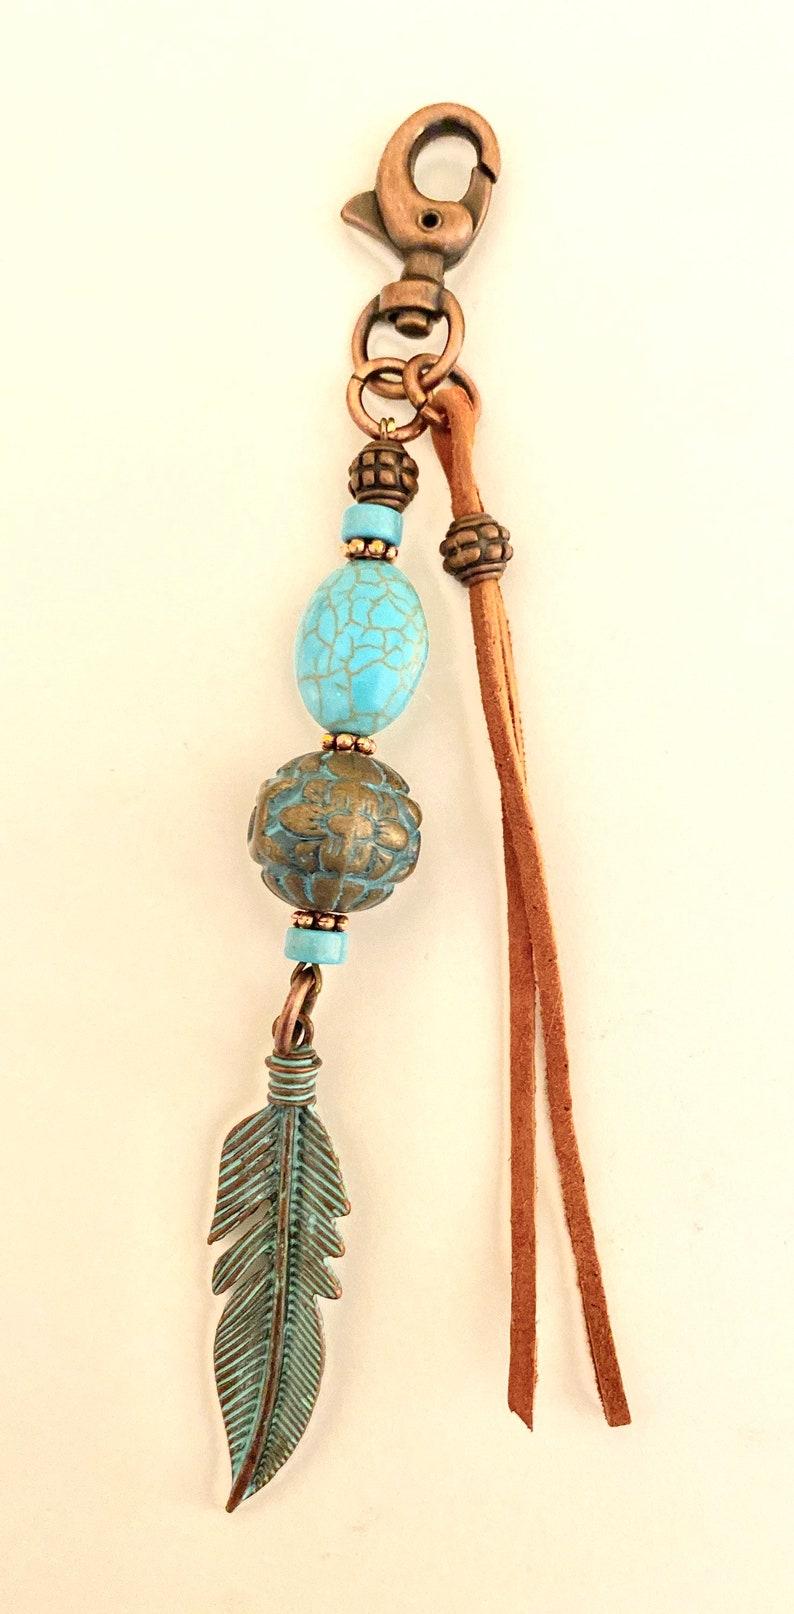 Southwest keychainbrown leather tasselBoho style keychainturquoise beaded keychain